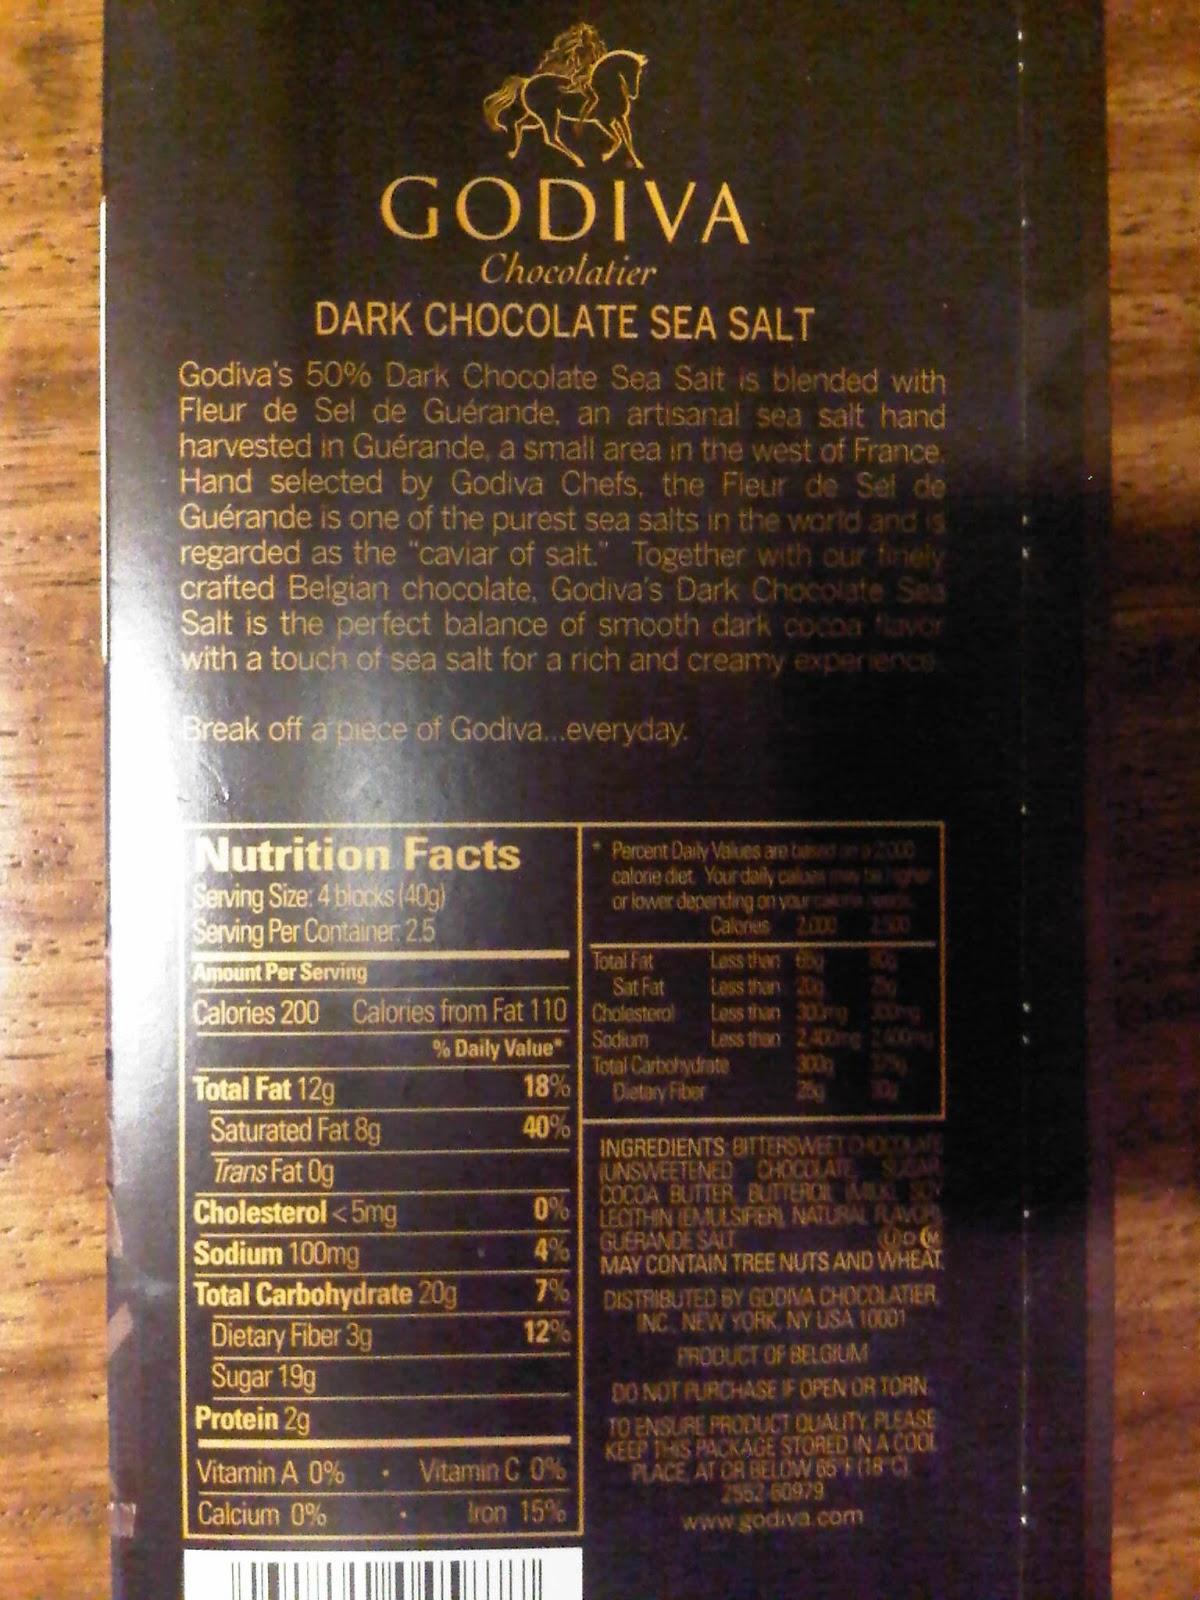 Godiva Chocolate Nutrition